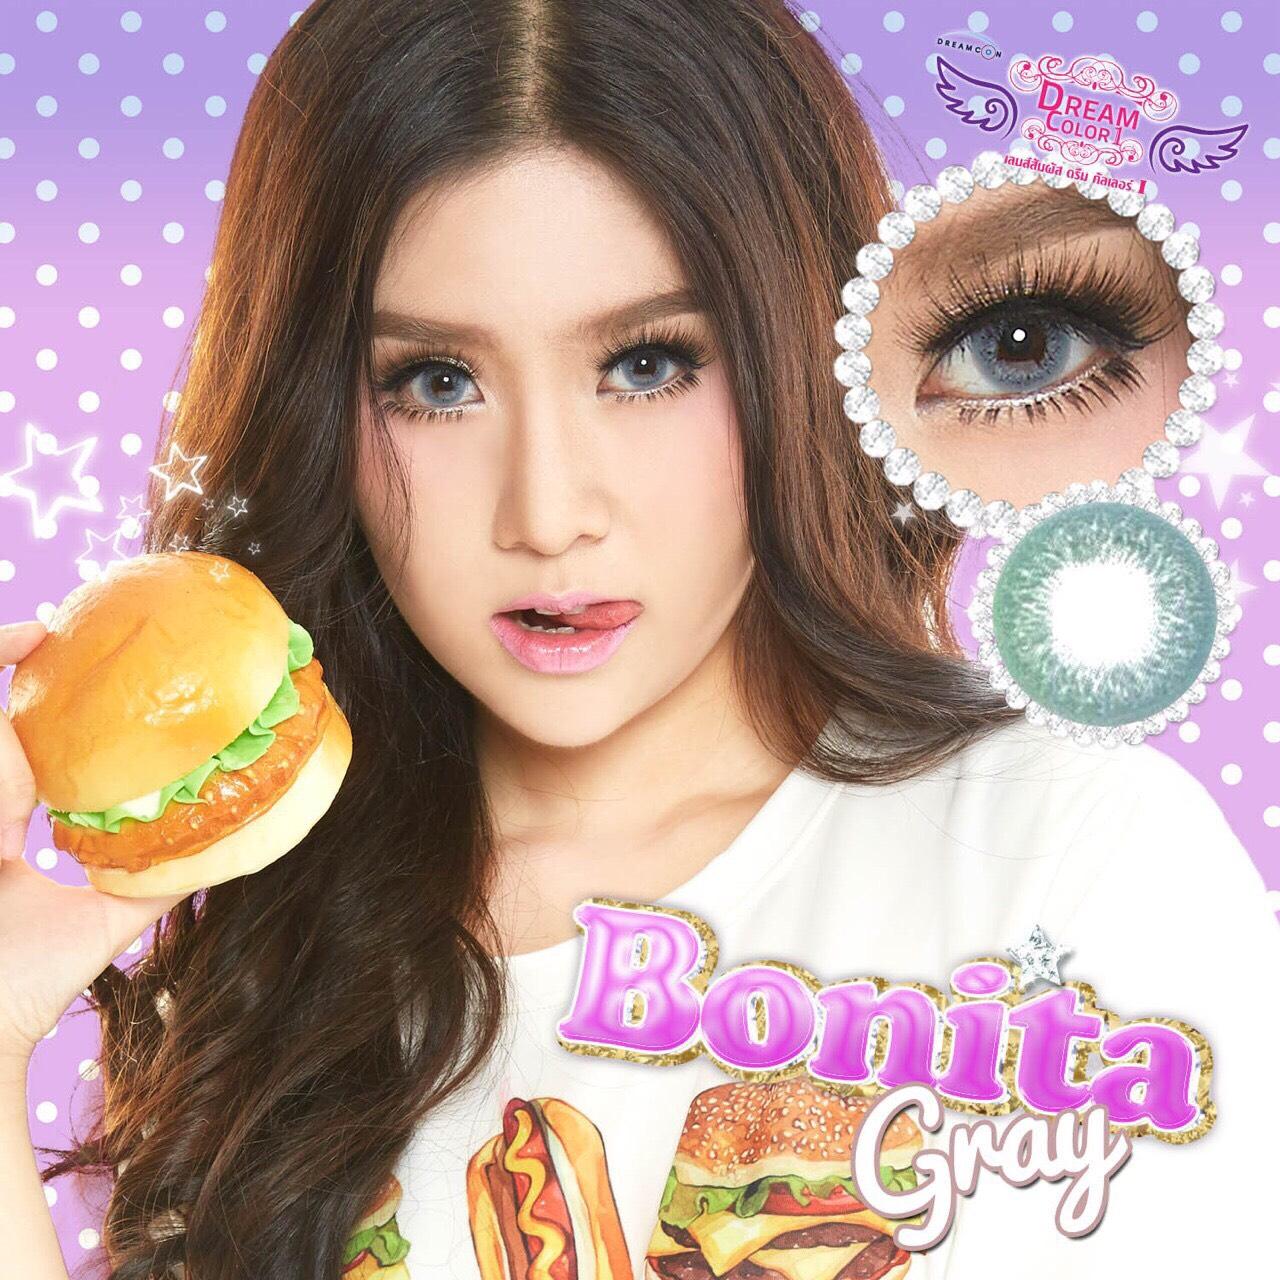 Bonita Gray Dreamcolor1เลนส์นิ่มใส่สบาย คอนแทคเลนส์ ขายส่งคอนแทคเลนส์ ขายส่งBigeye Bigeyeเกาหลี